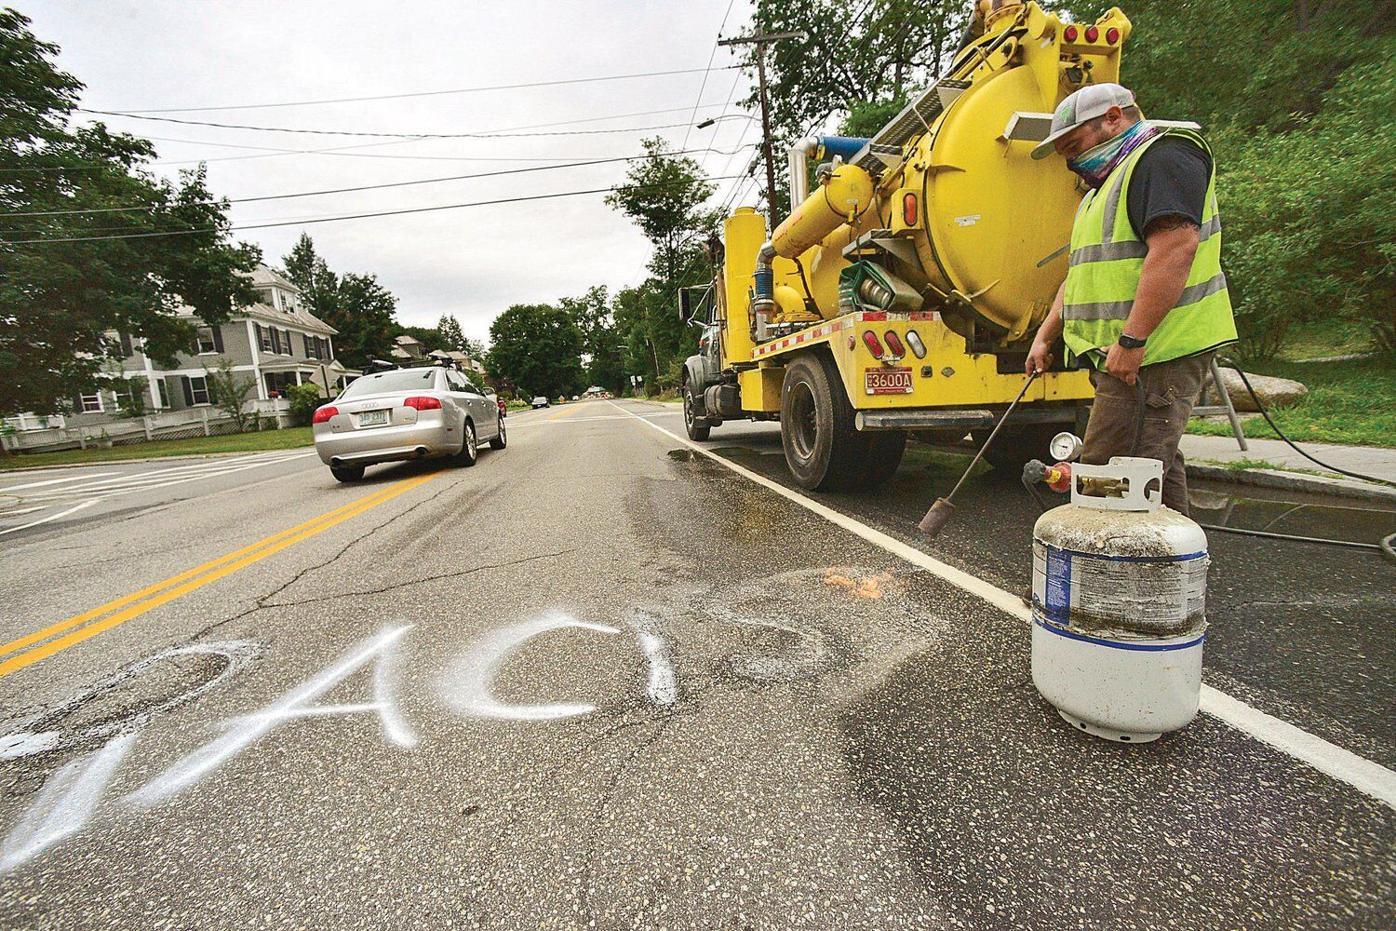 Anti-BLM graffiti pops up around Windham County